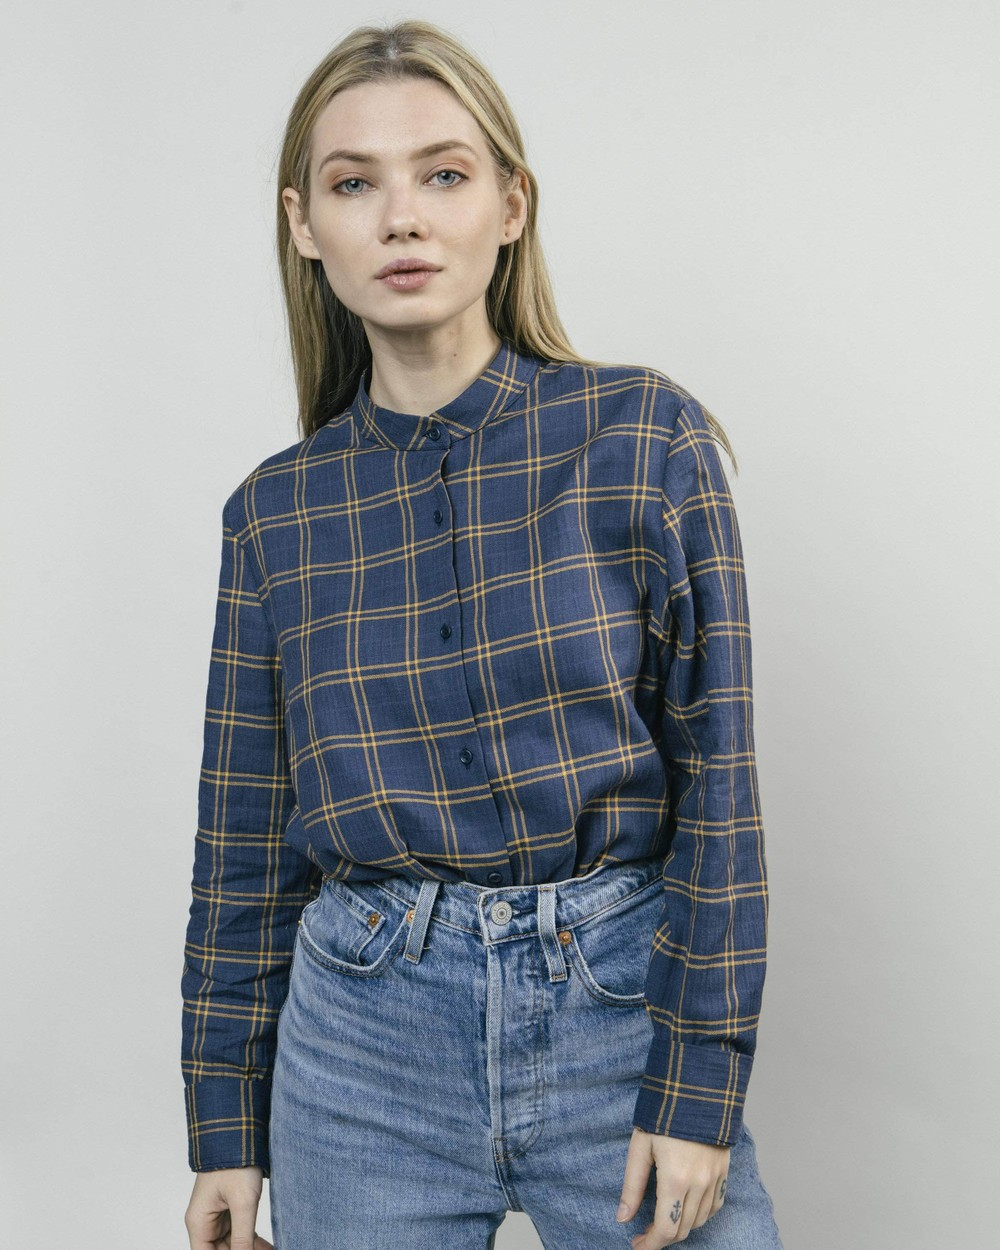 Woodcutter essential blouse - Brava Fabrics